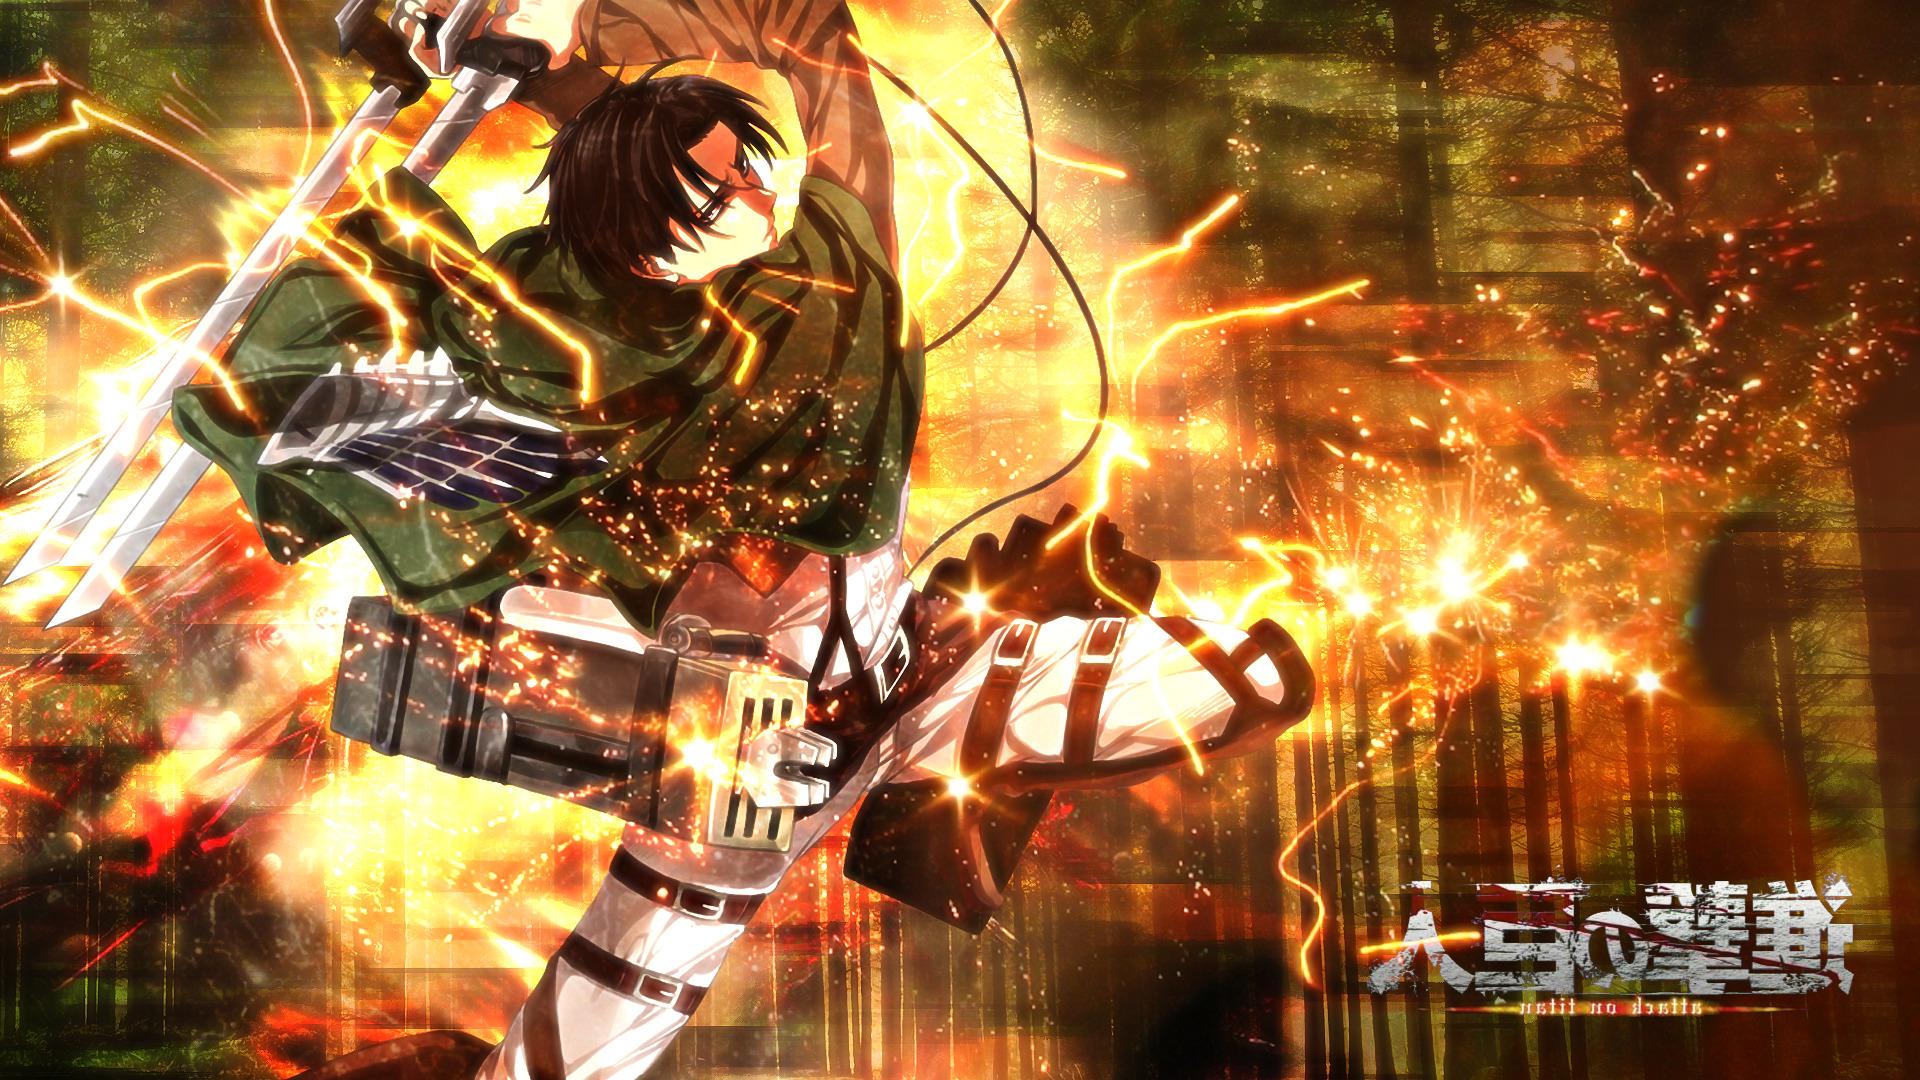 shingeki no kyojin levi ackerman anime wallpaper and